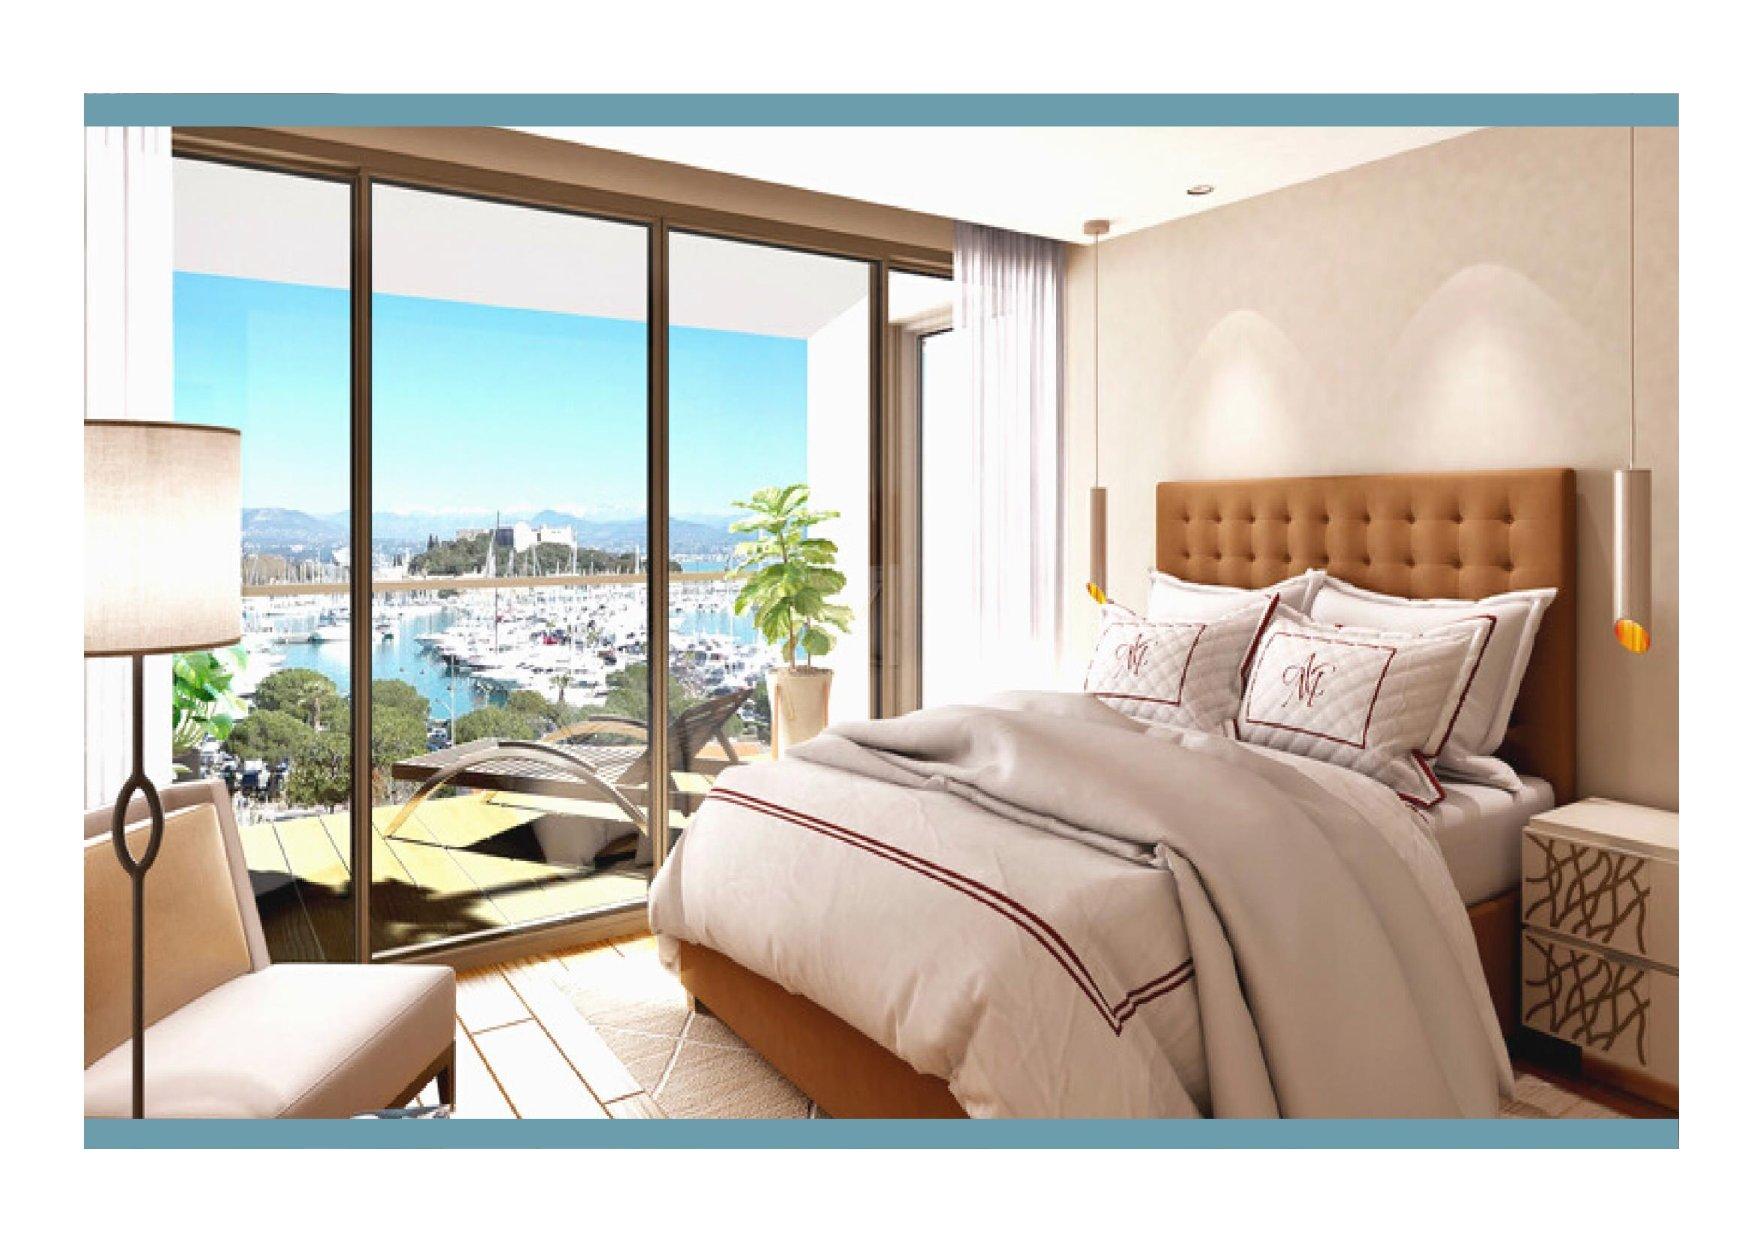 PORT VAUBAN - PENTHOUSE 3 BEDROOMS 150 M2